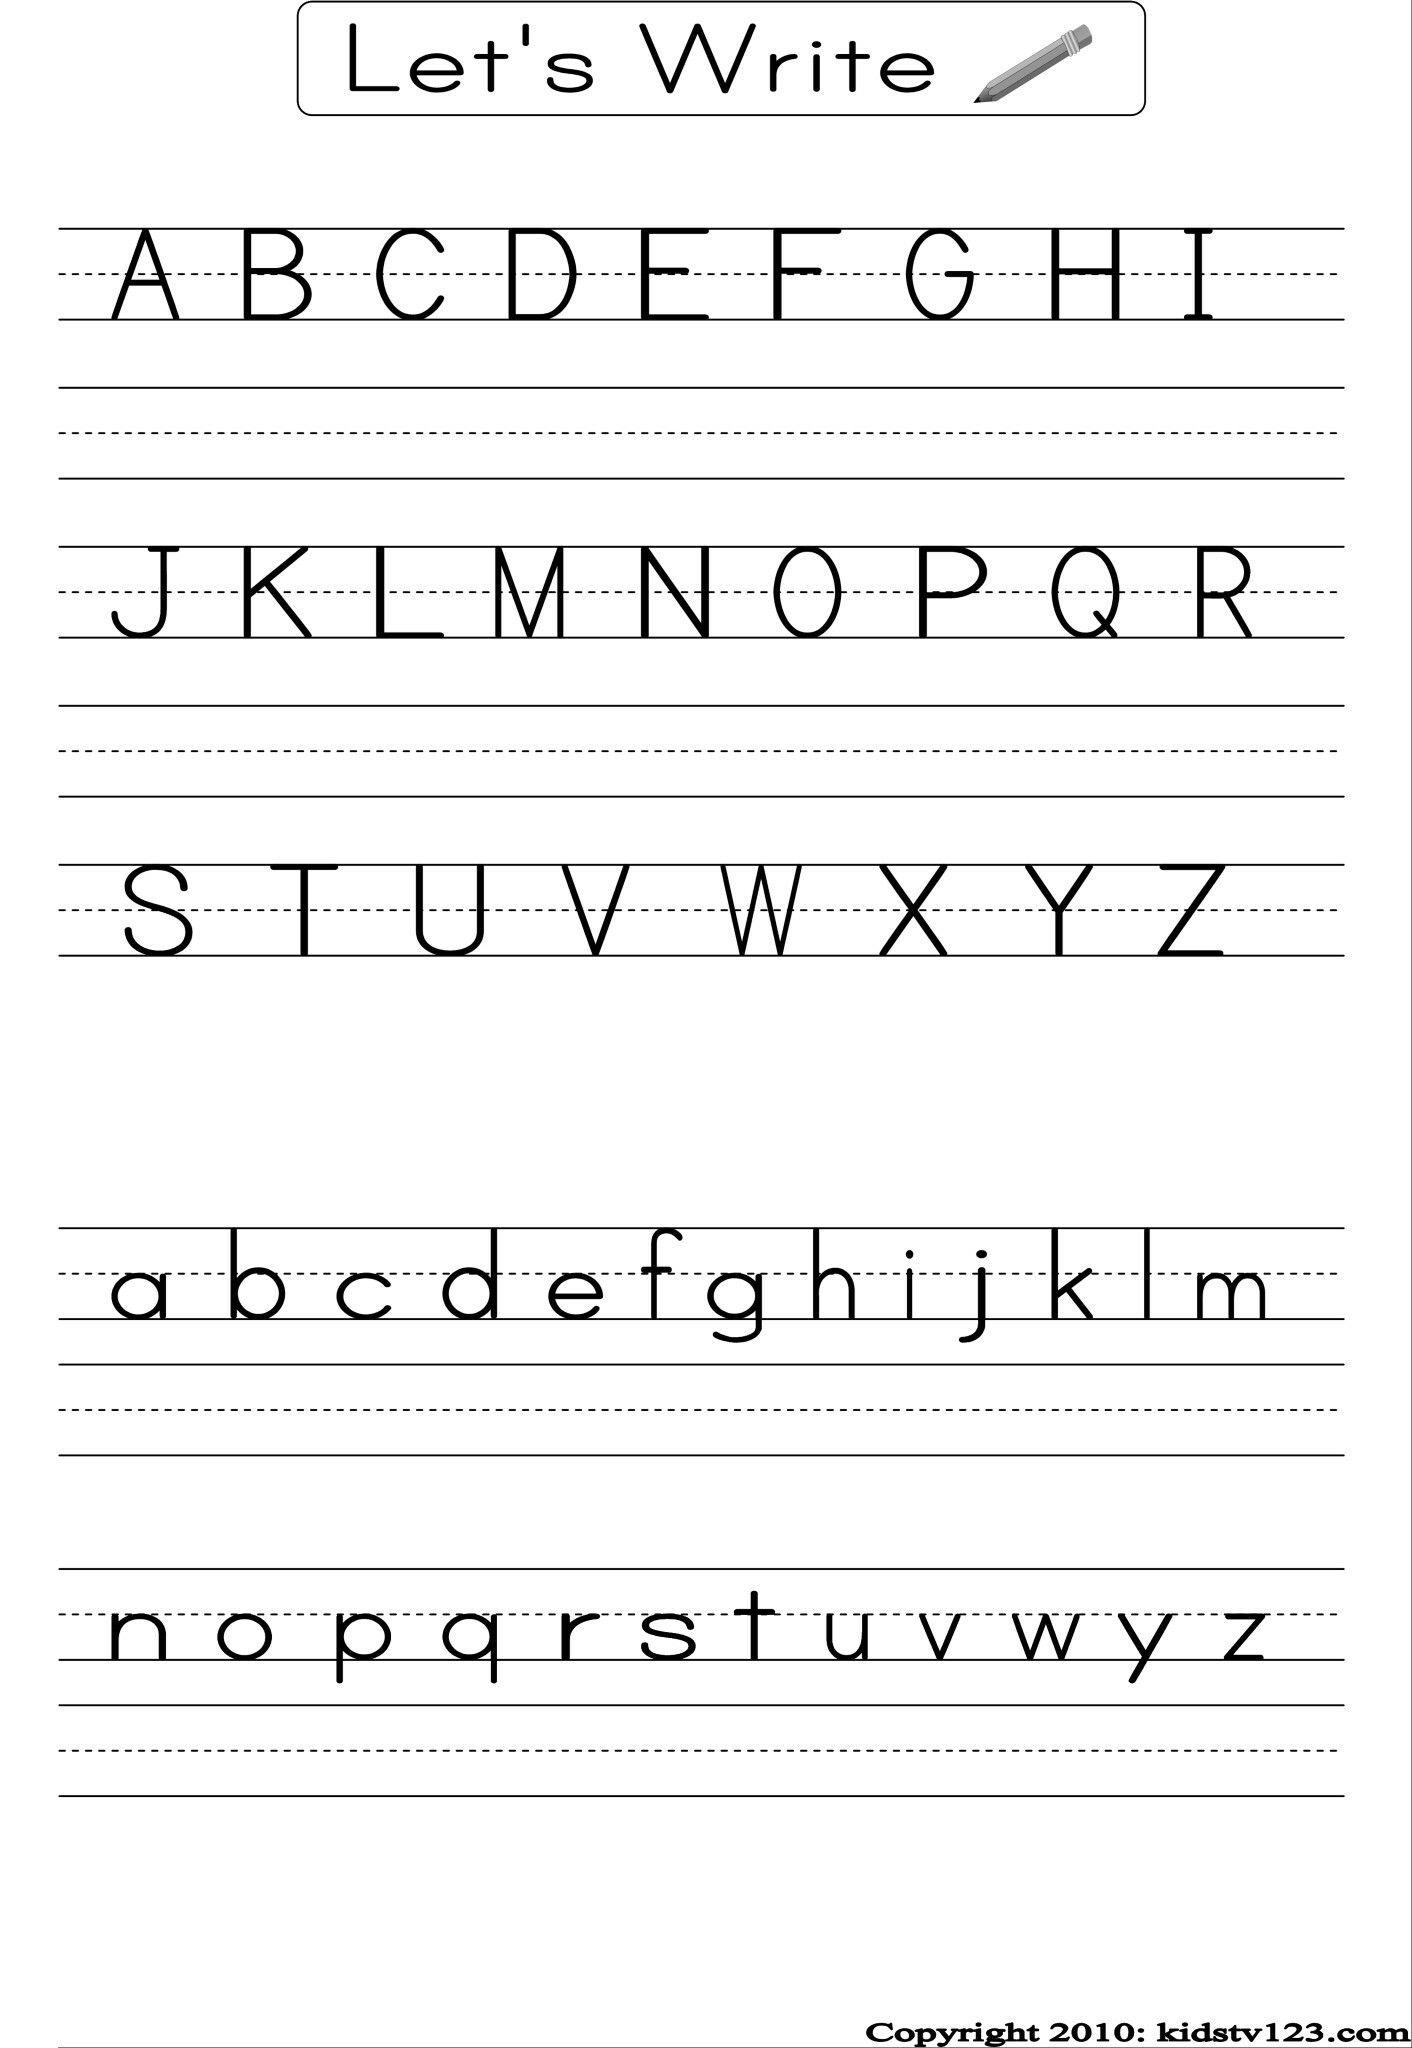 Pin By Alma Padron On Homeschool Alphabet Writing Practice Writing Practice Worksheets Writing Practice